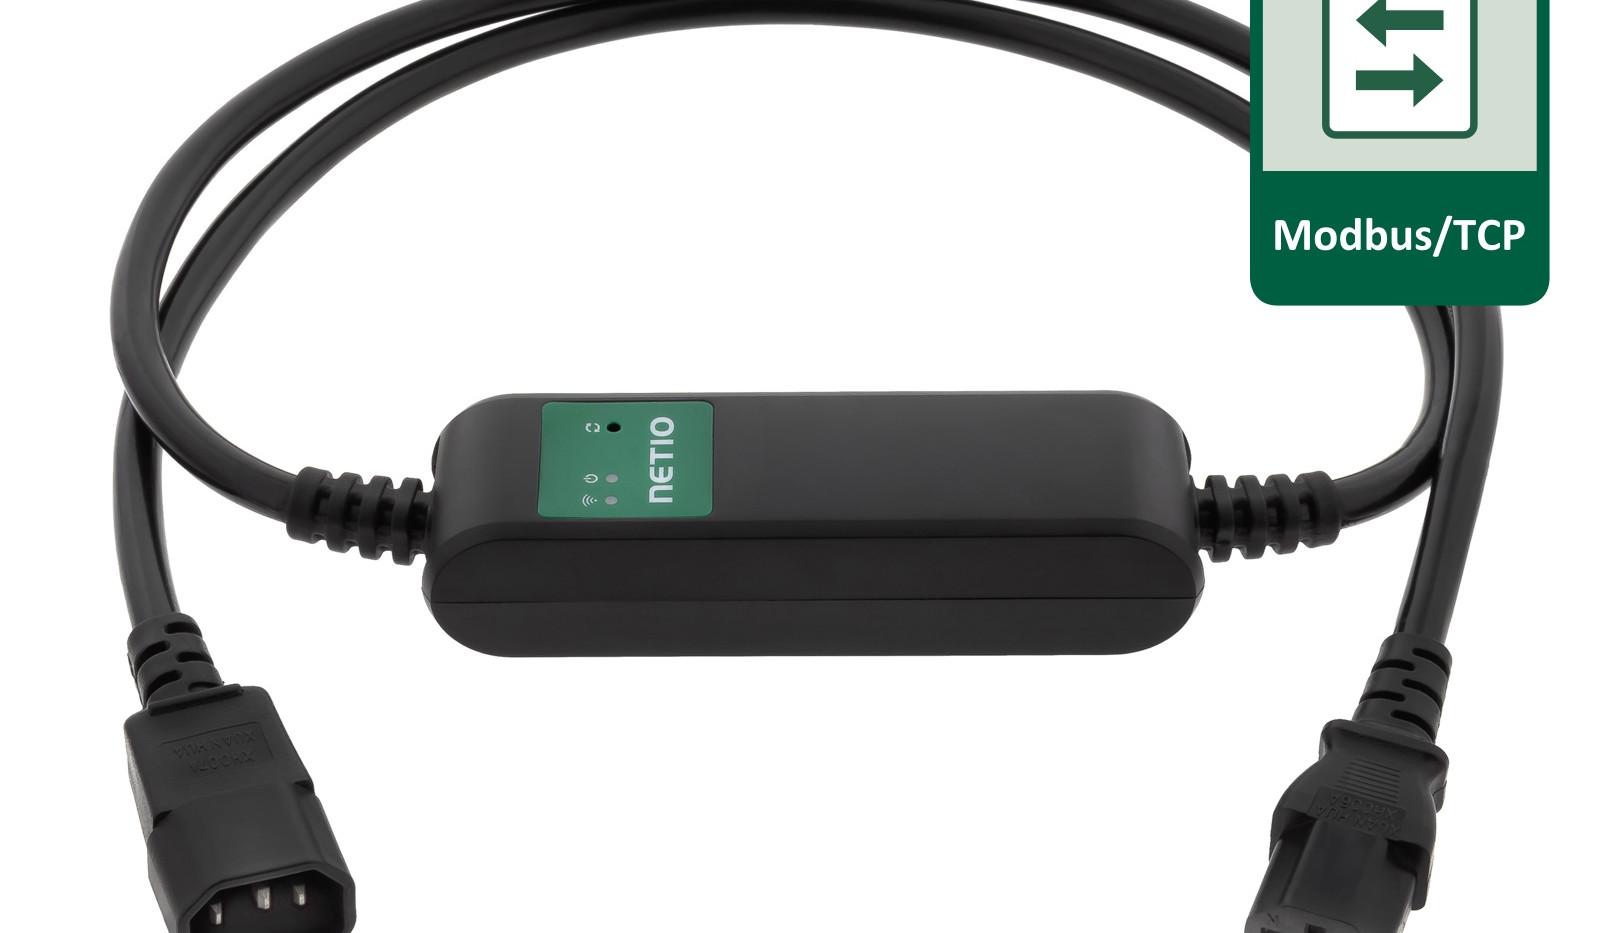 PowerCable-Modbus-101S_IEC320-C13-C14-wi